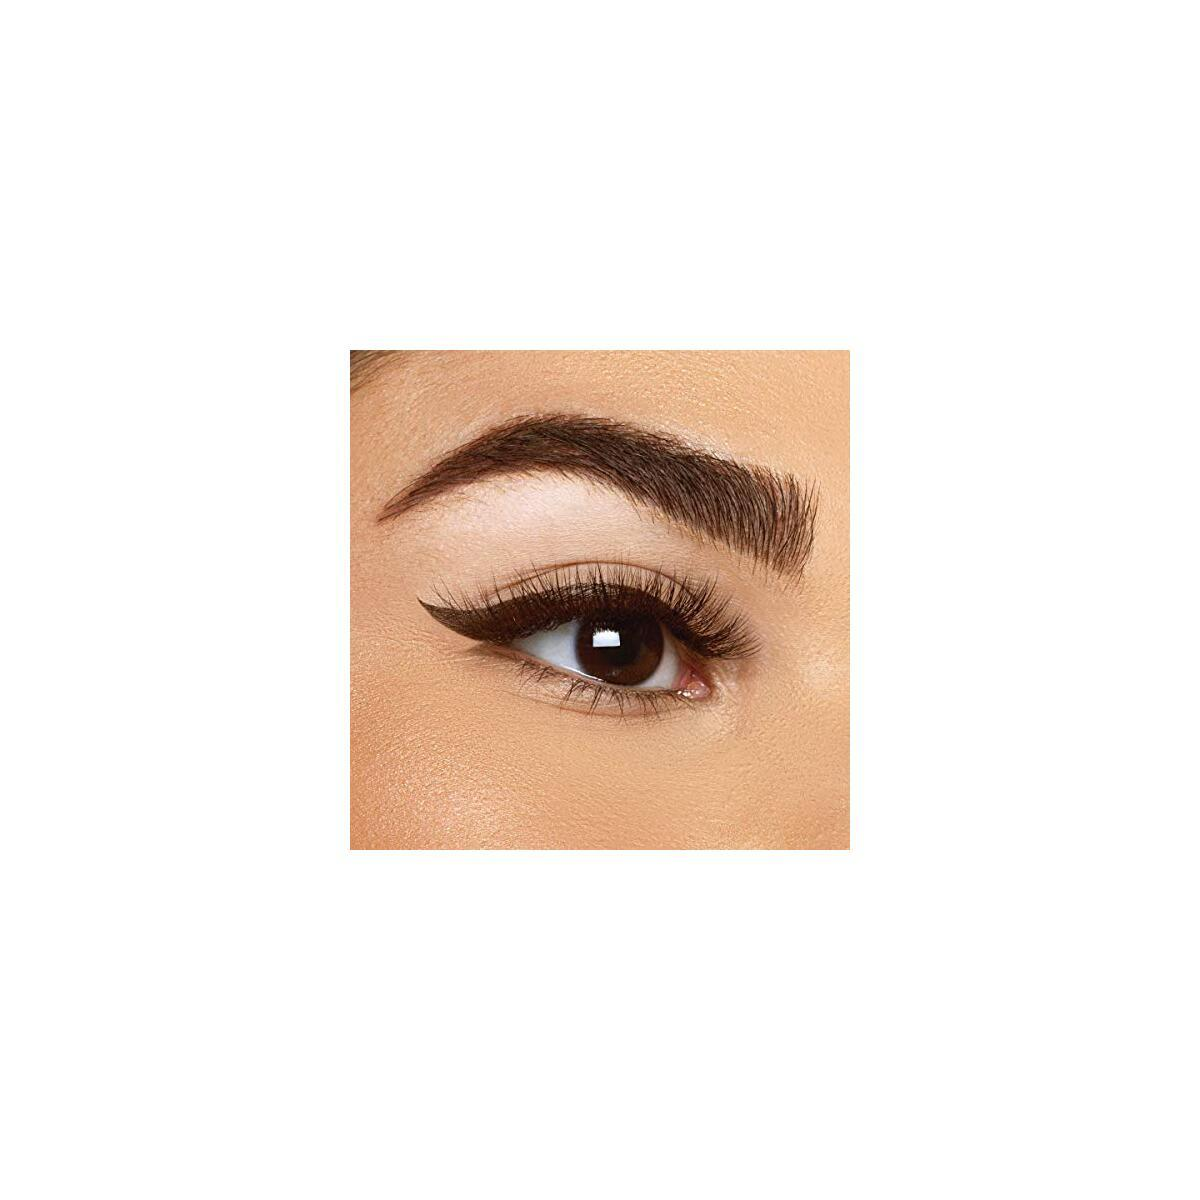 EONLiner Eyeliner Pen - Liquid Eyeliner & Lash Growth Serum – Epic Ink Liner | Super Slim Long-Lasting | Slim Tip | Smudge Proof Liquid Eyeliner - 12 Hours Treatment